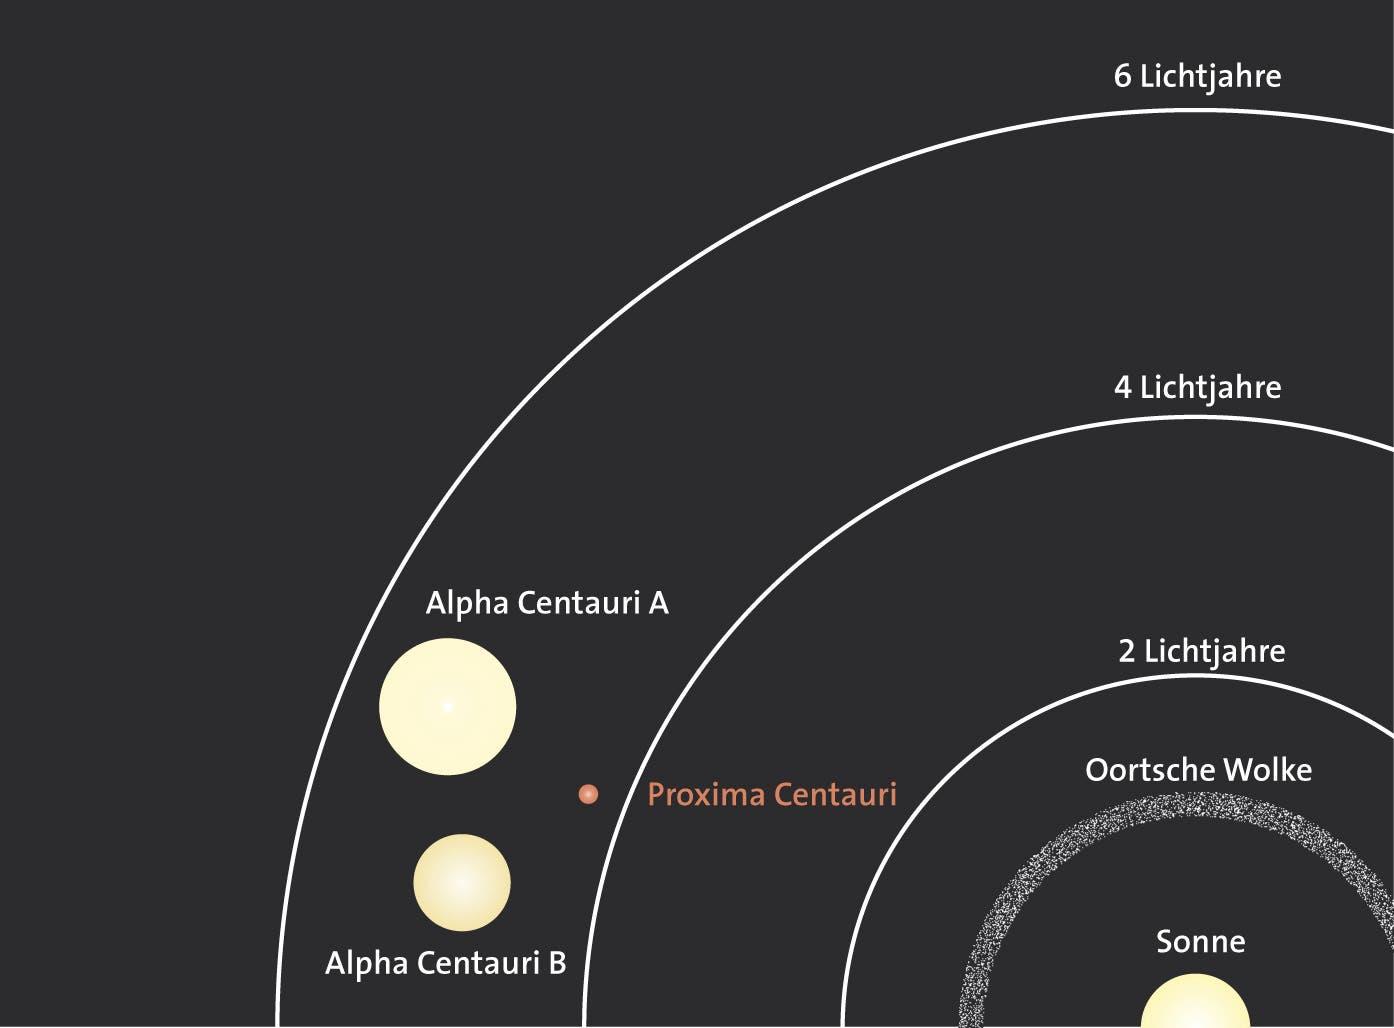 Alpha Centauri und Proxima Centauri